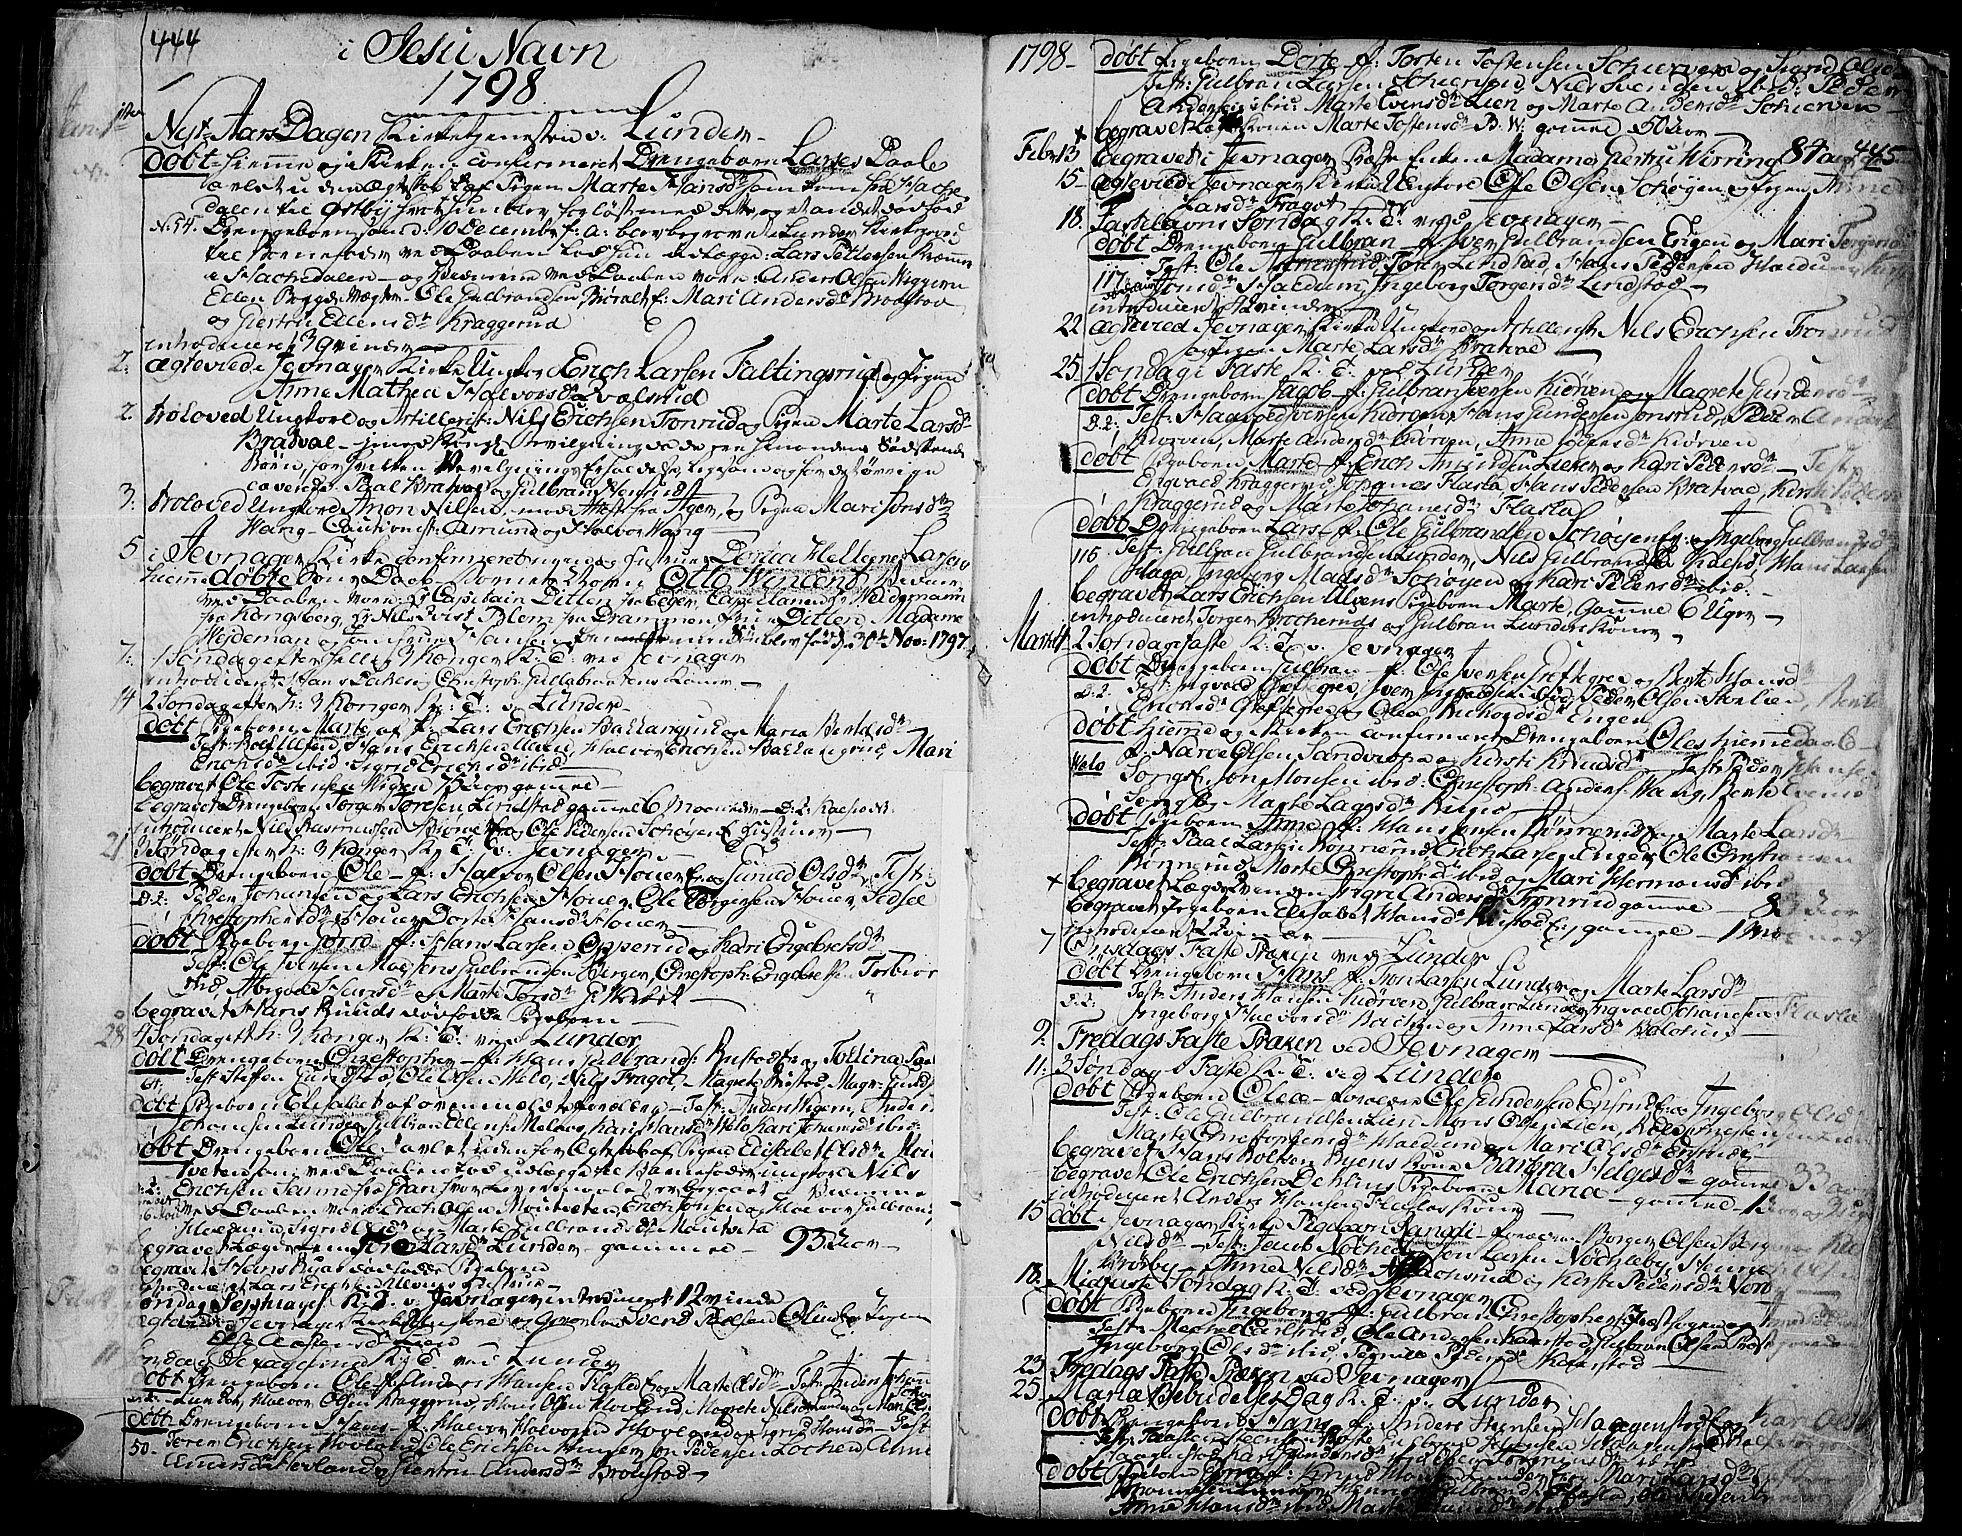 SAH, Jevnaker prestekontor, Ministerialbok nr. 3, 1752-1799, s. 444-445